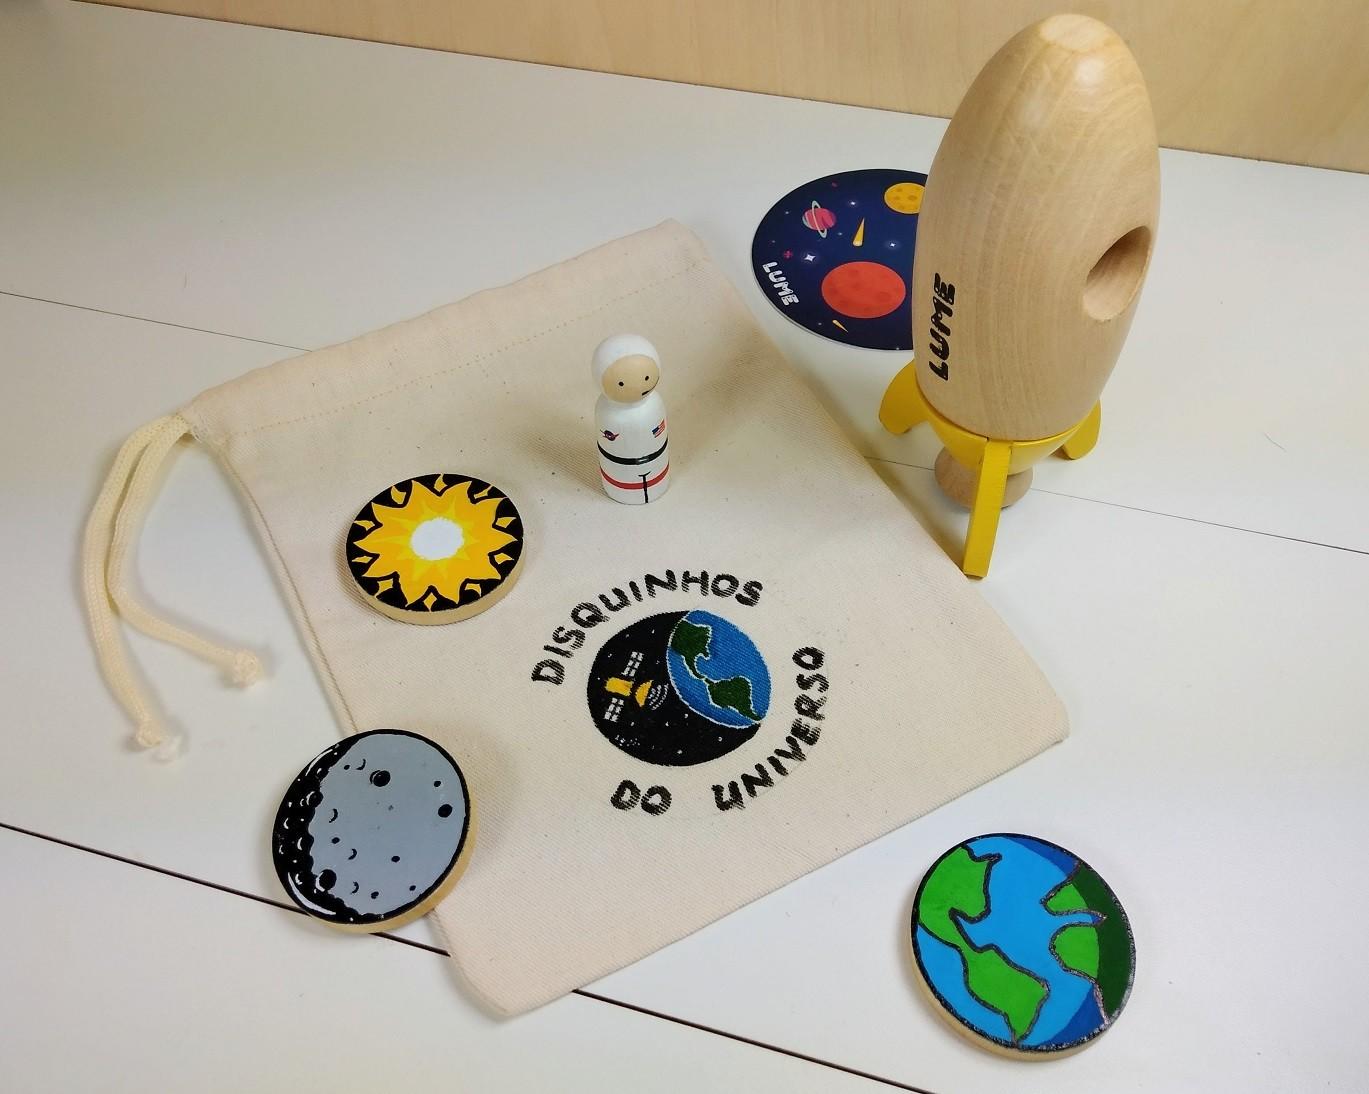 KIT Minifoguete (da Lume) e Disquinhos do Universo - Cód. LM-63 + Peg-008